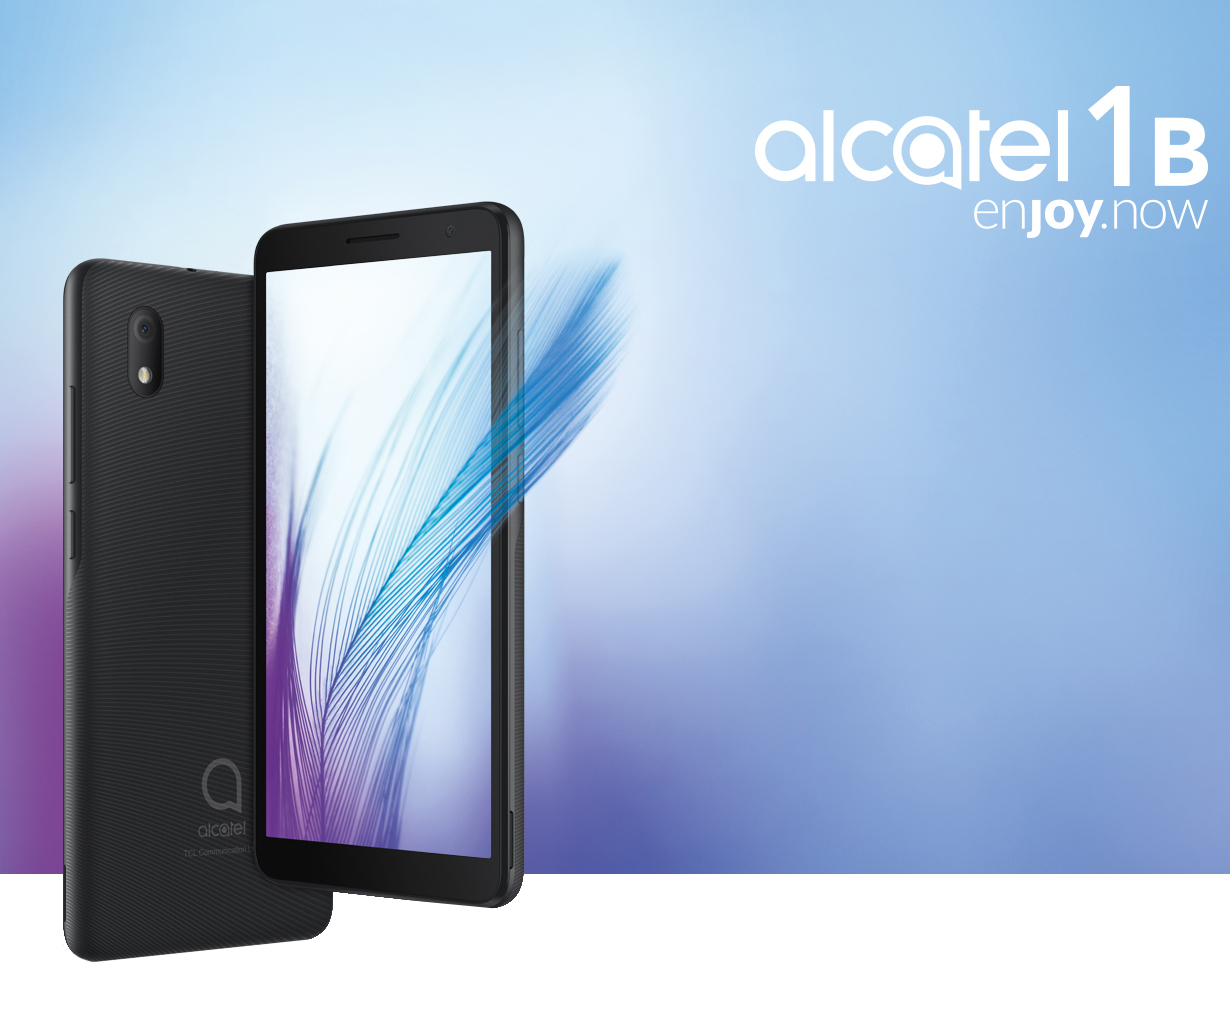 Alcatel 1B